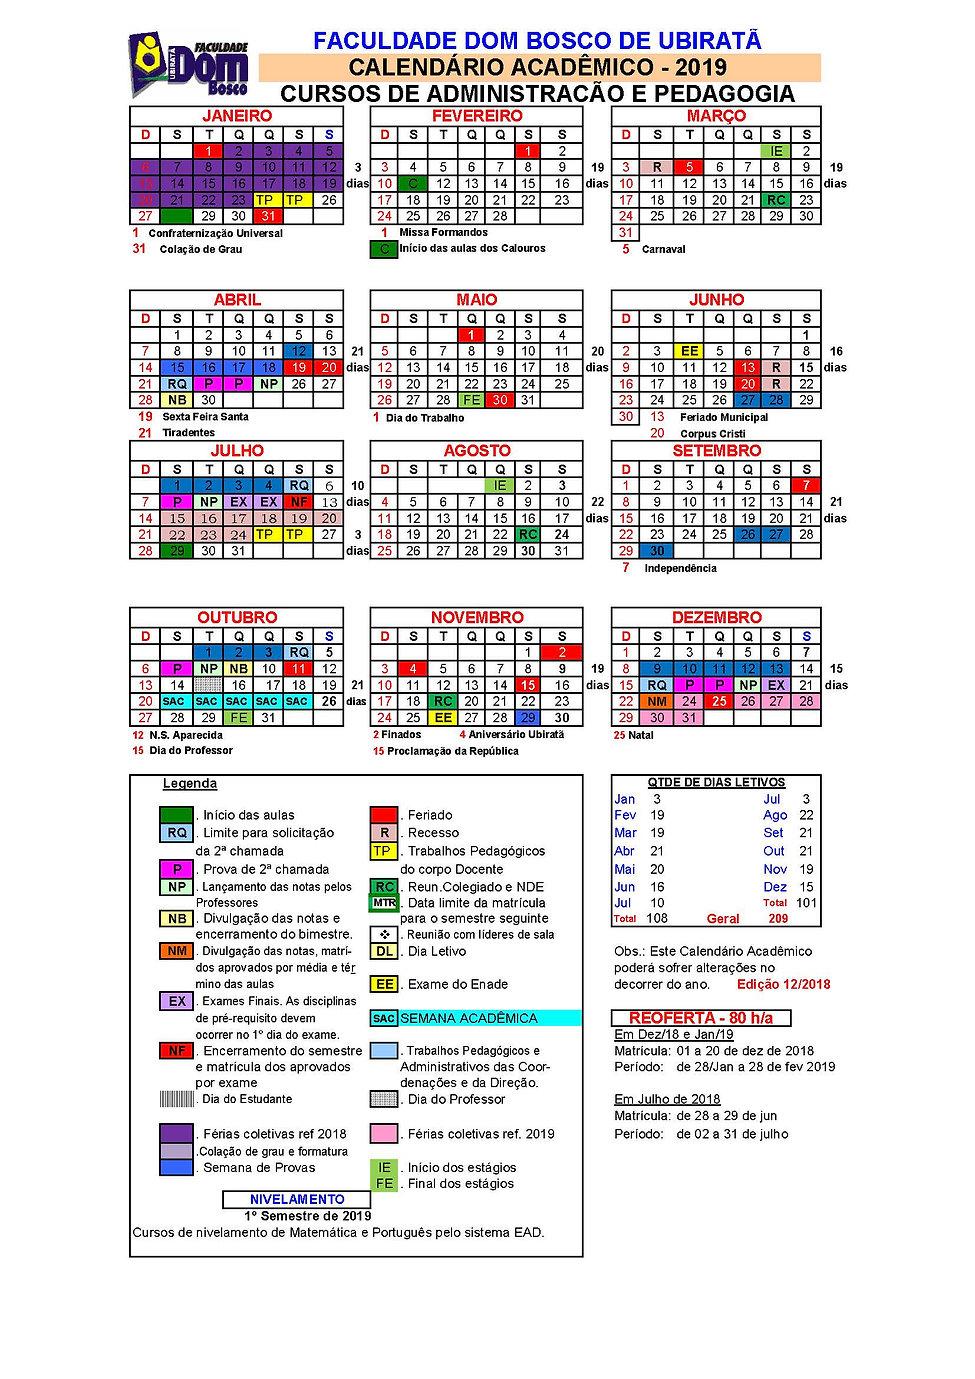 Calendario anual 2019 Ubirata.jpg